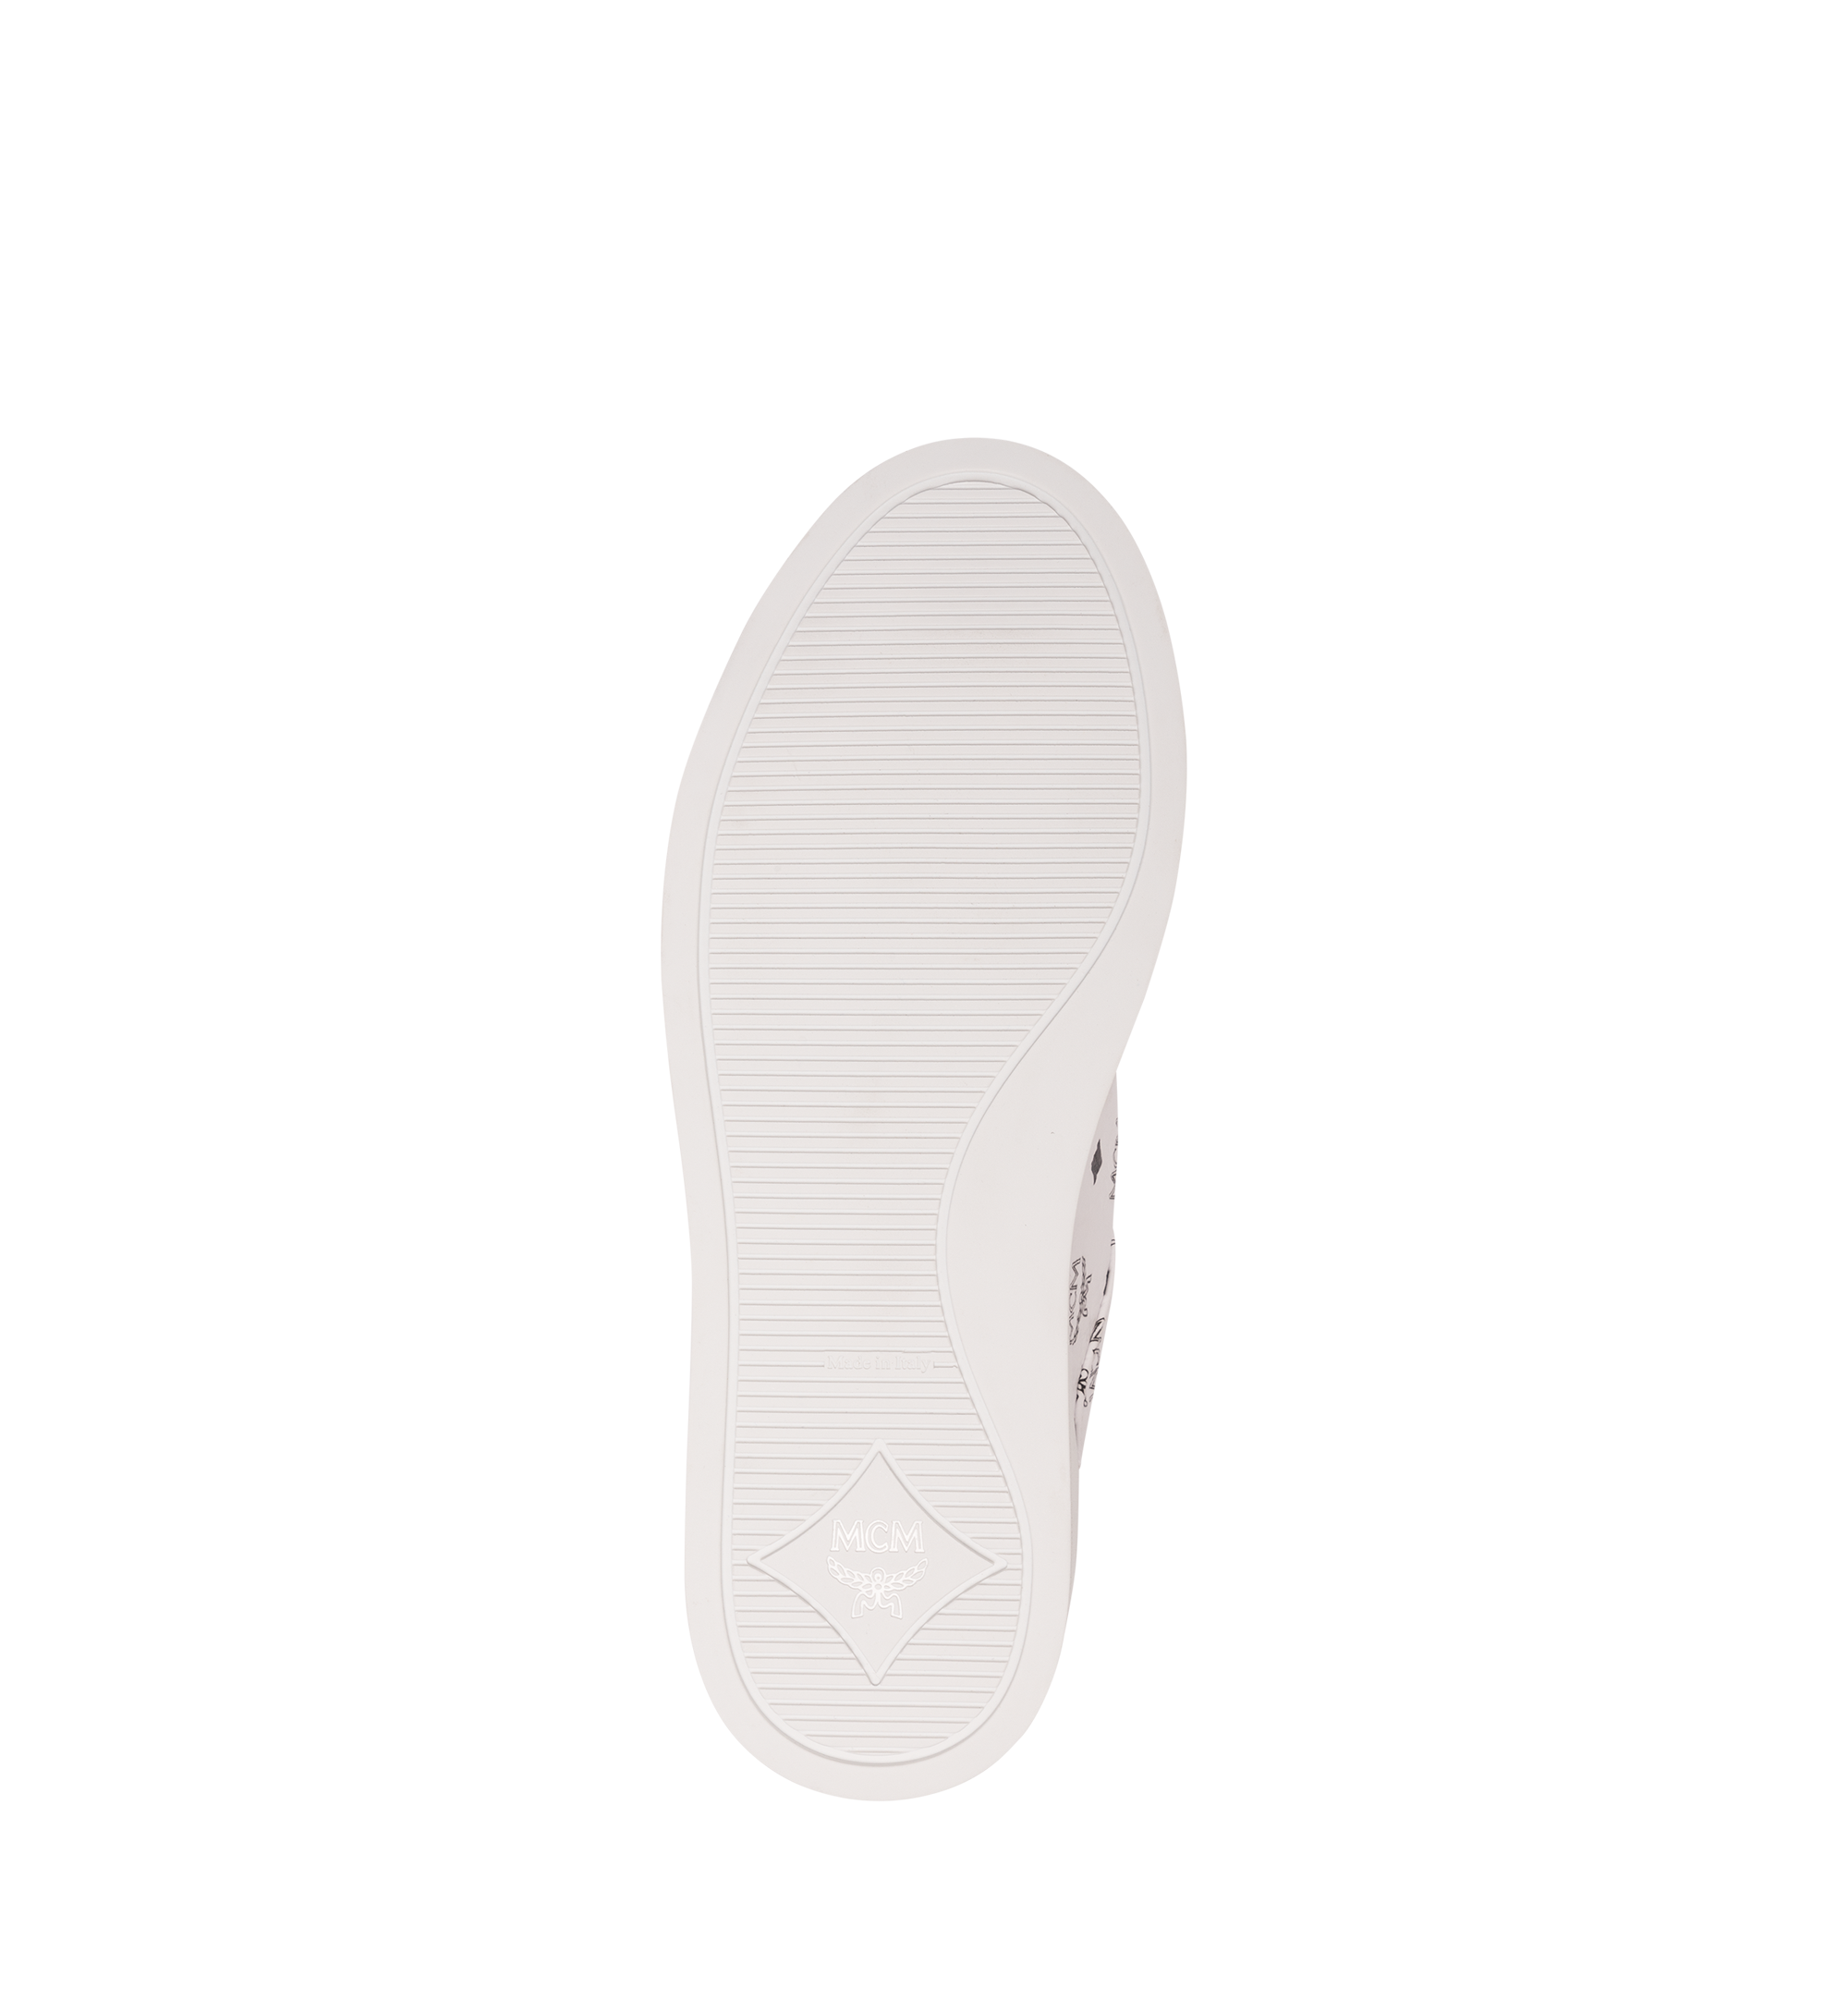 MCM メンズ クラシック ヴィセトス ロートップスニーカー White MEX9SMM04WT044 Alternate View 5